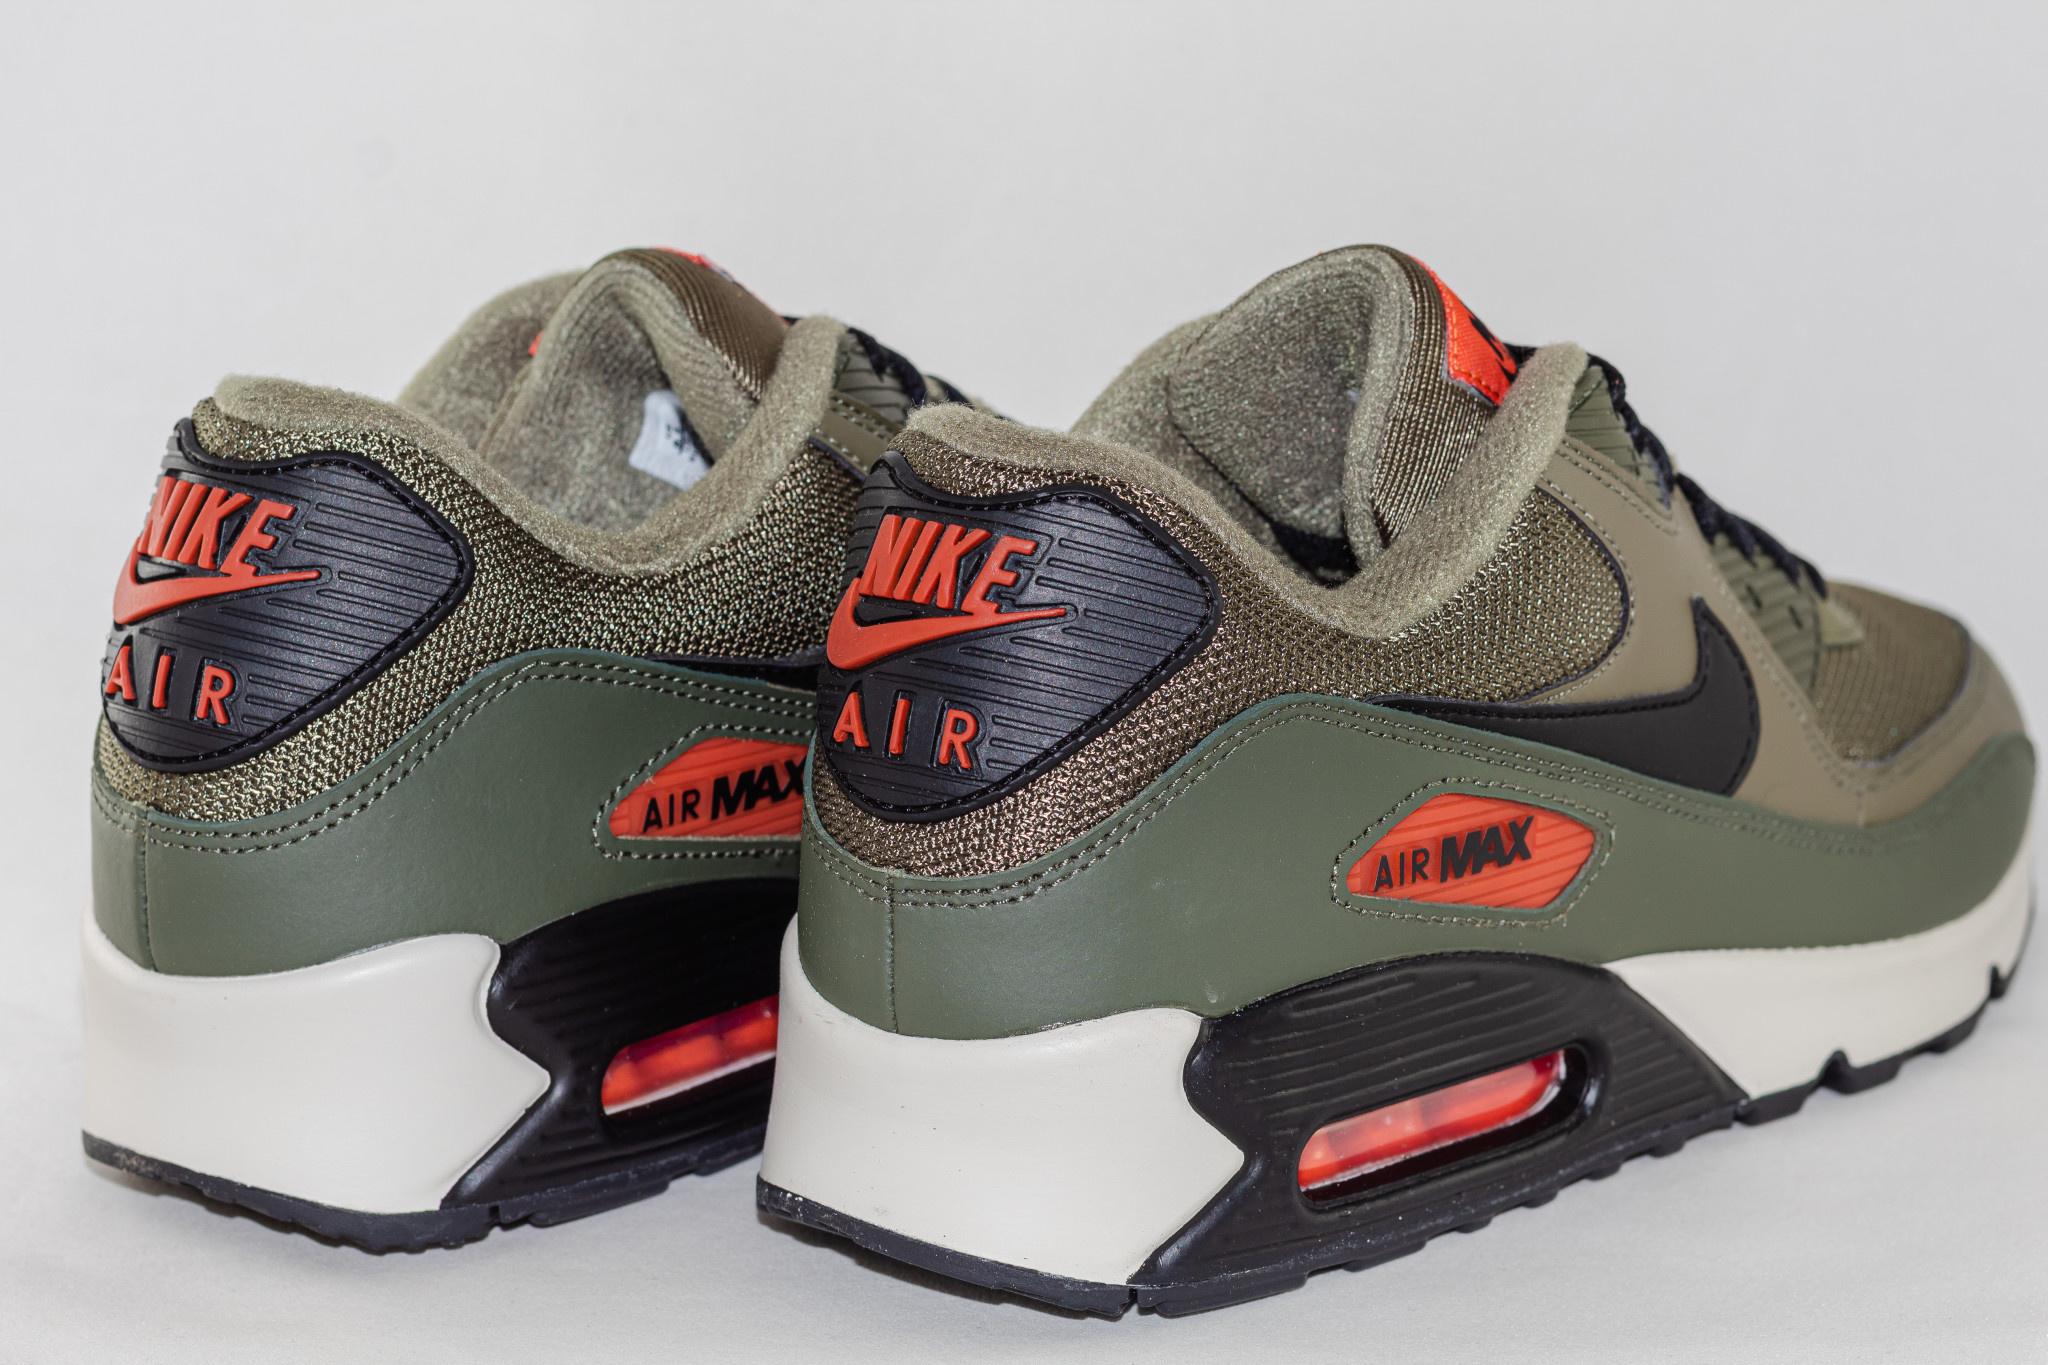 Nike NIKE AIR MAX 90 ESSENTIAL Medium Olive/ Black- Team Orange